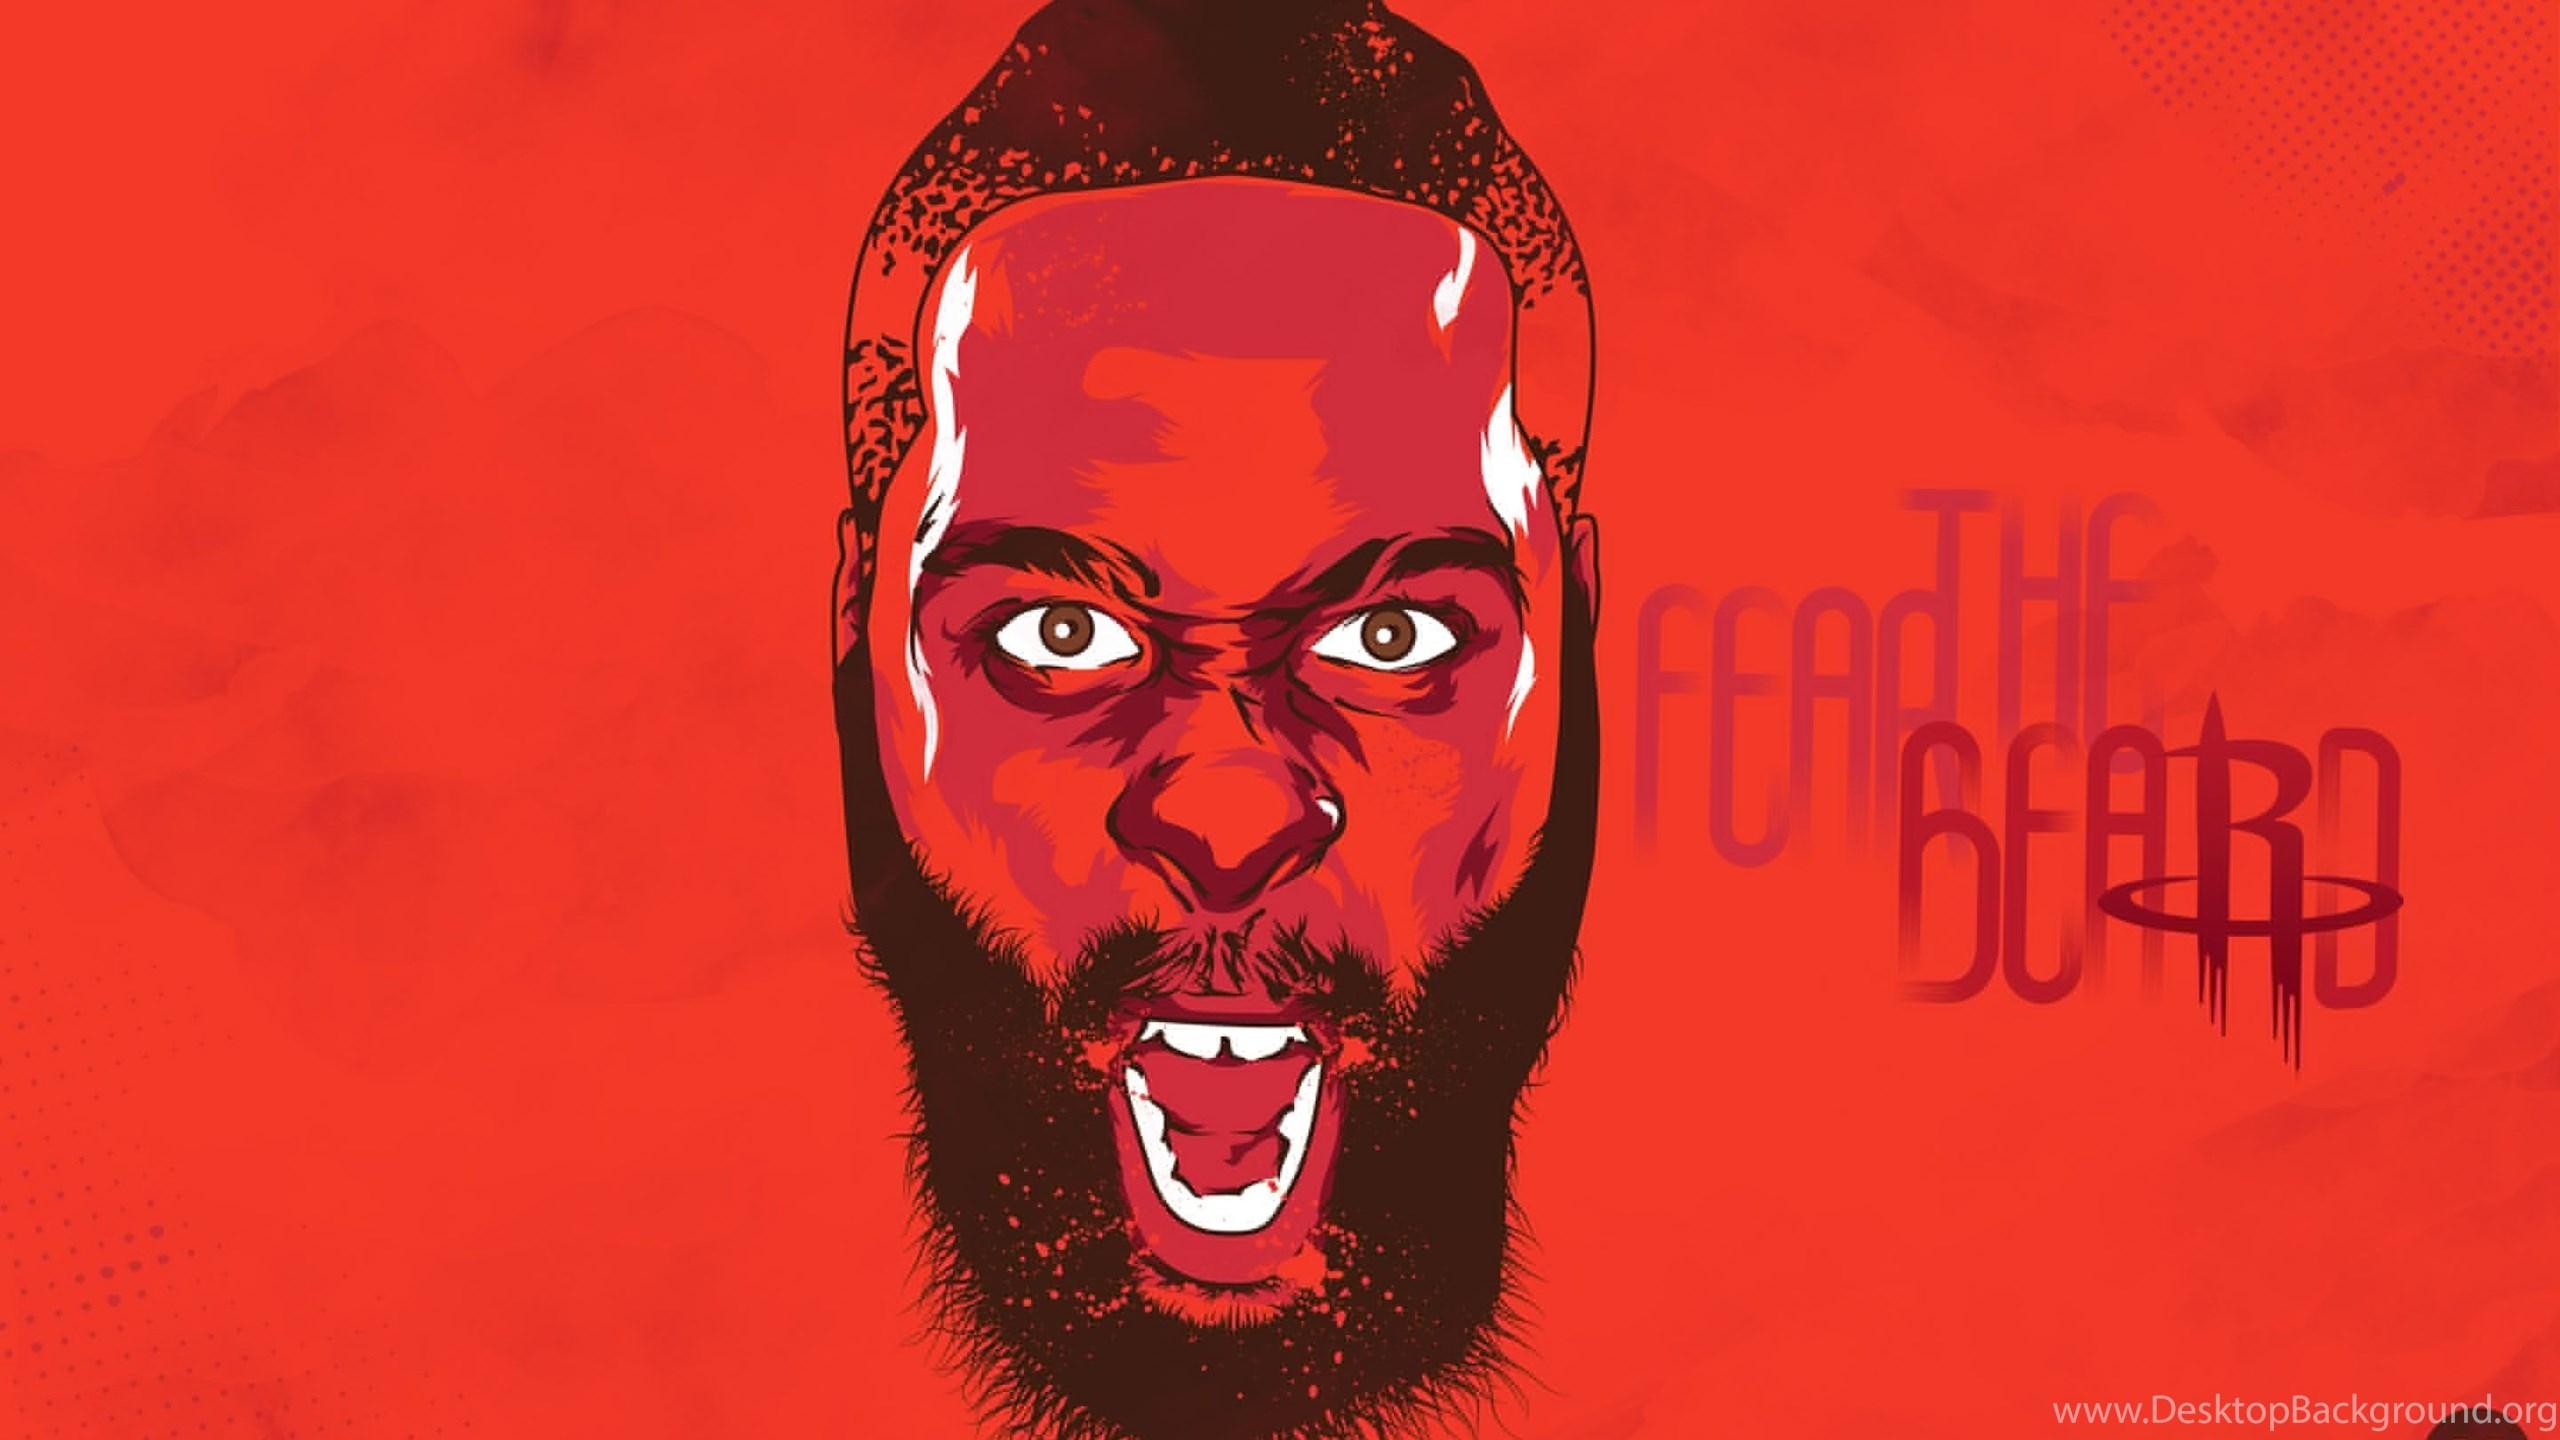 HOUSTON ROCKETS Basketball Nba Wallpapers Desktop Background